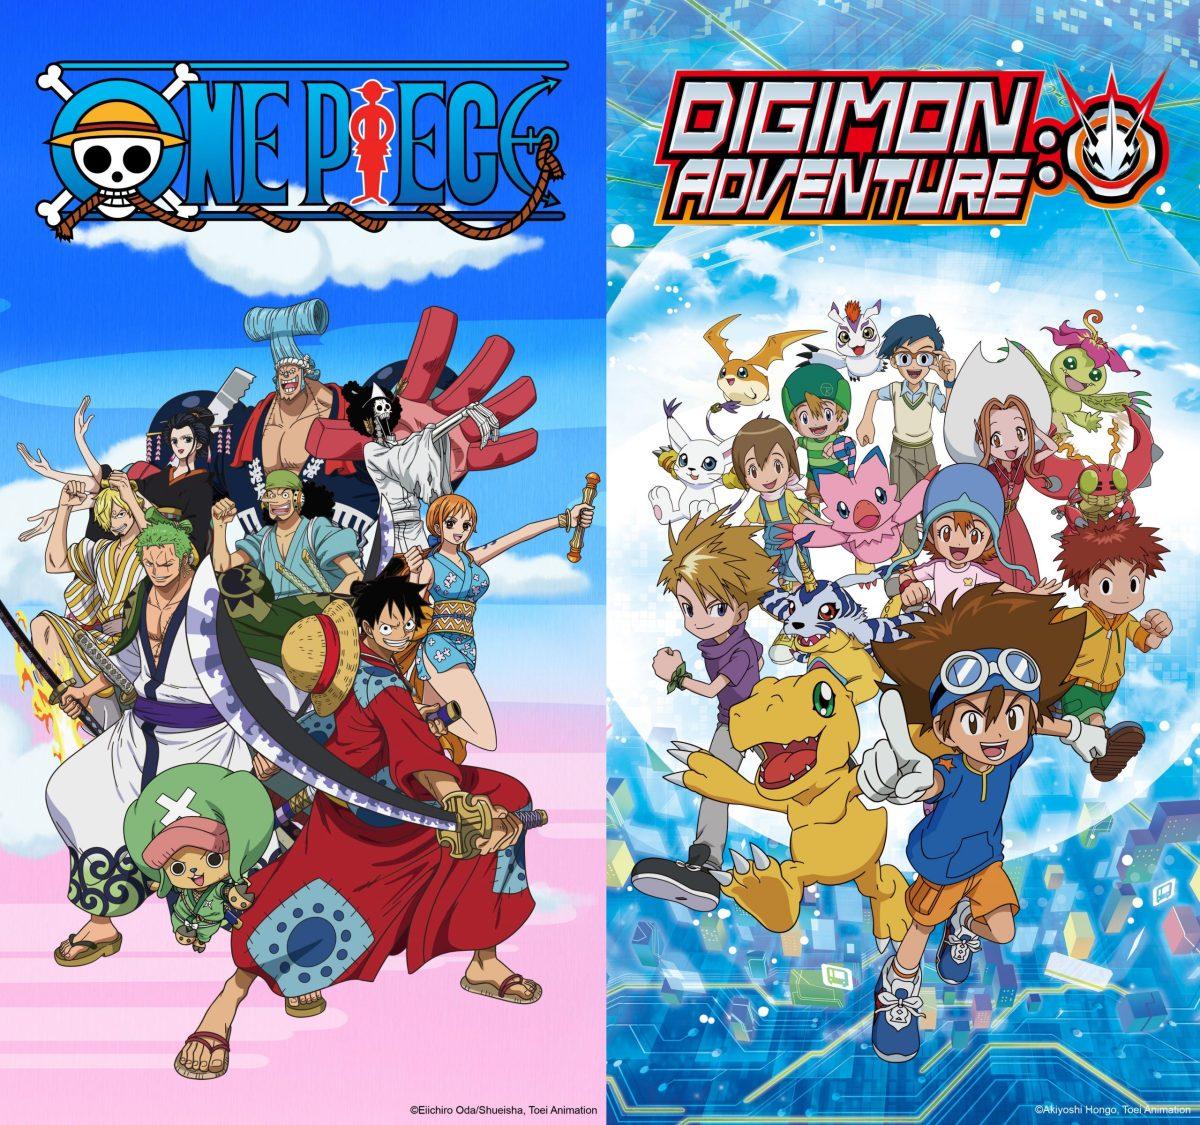 Toei Animation: Sejarah dan Daftar Anime 1